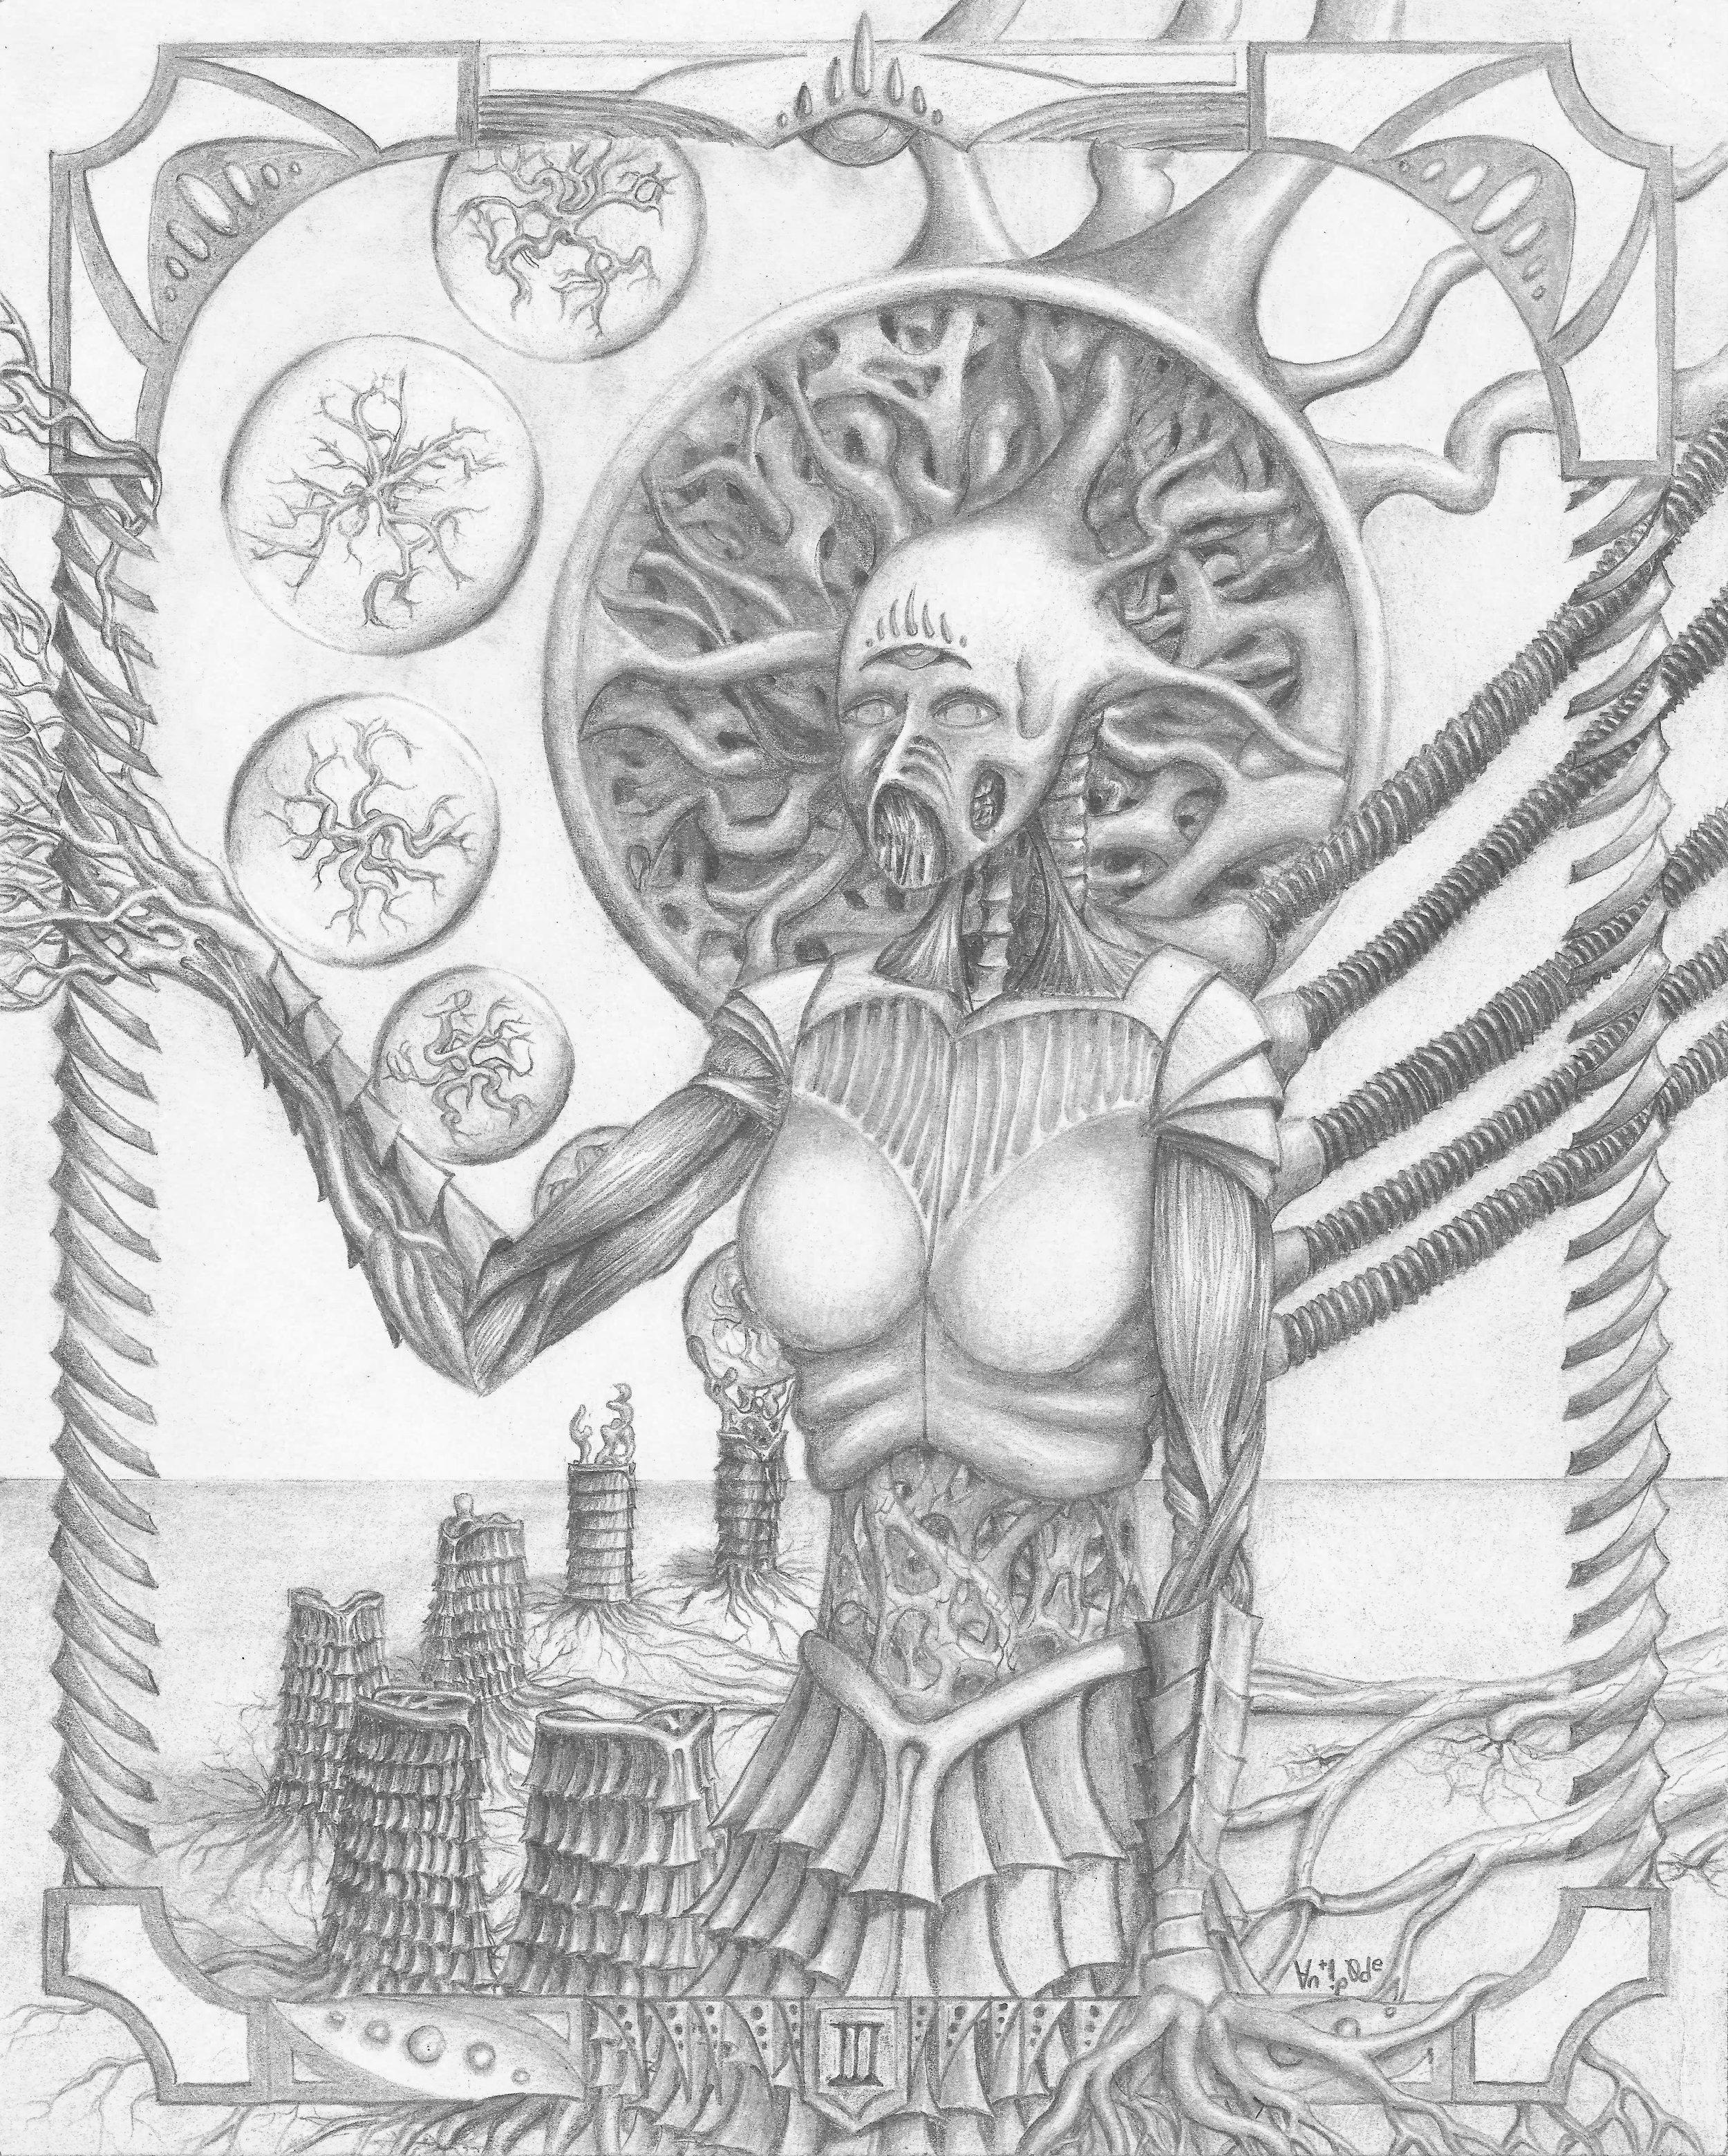 III, graphite on paper, 2015